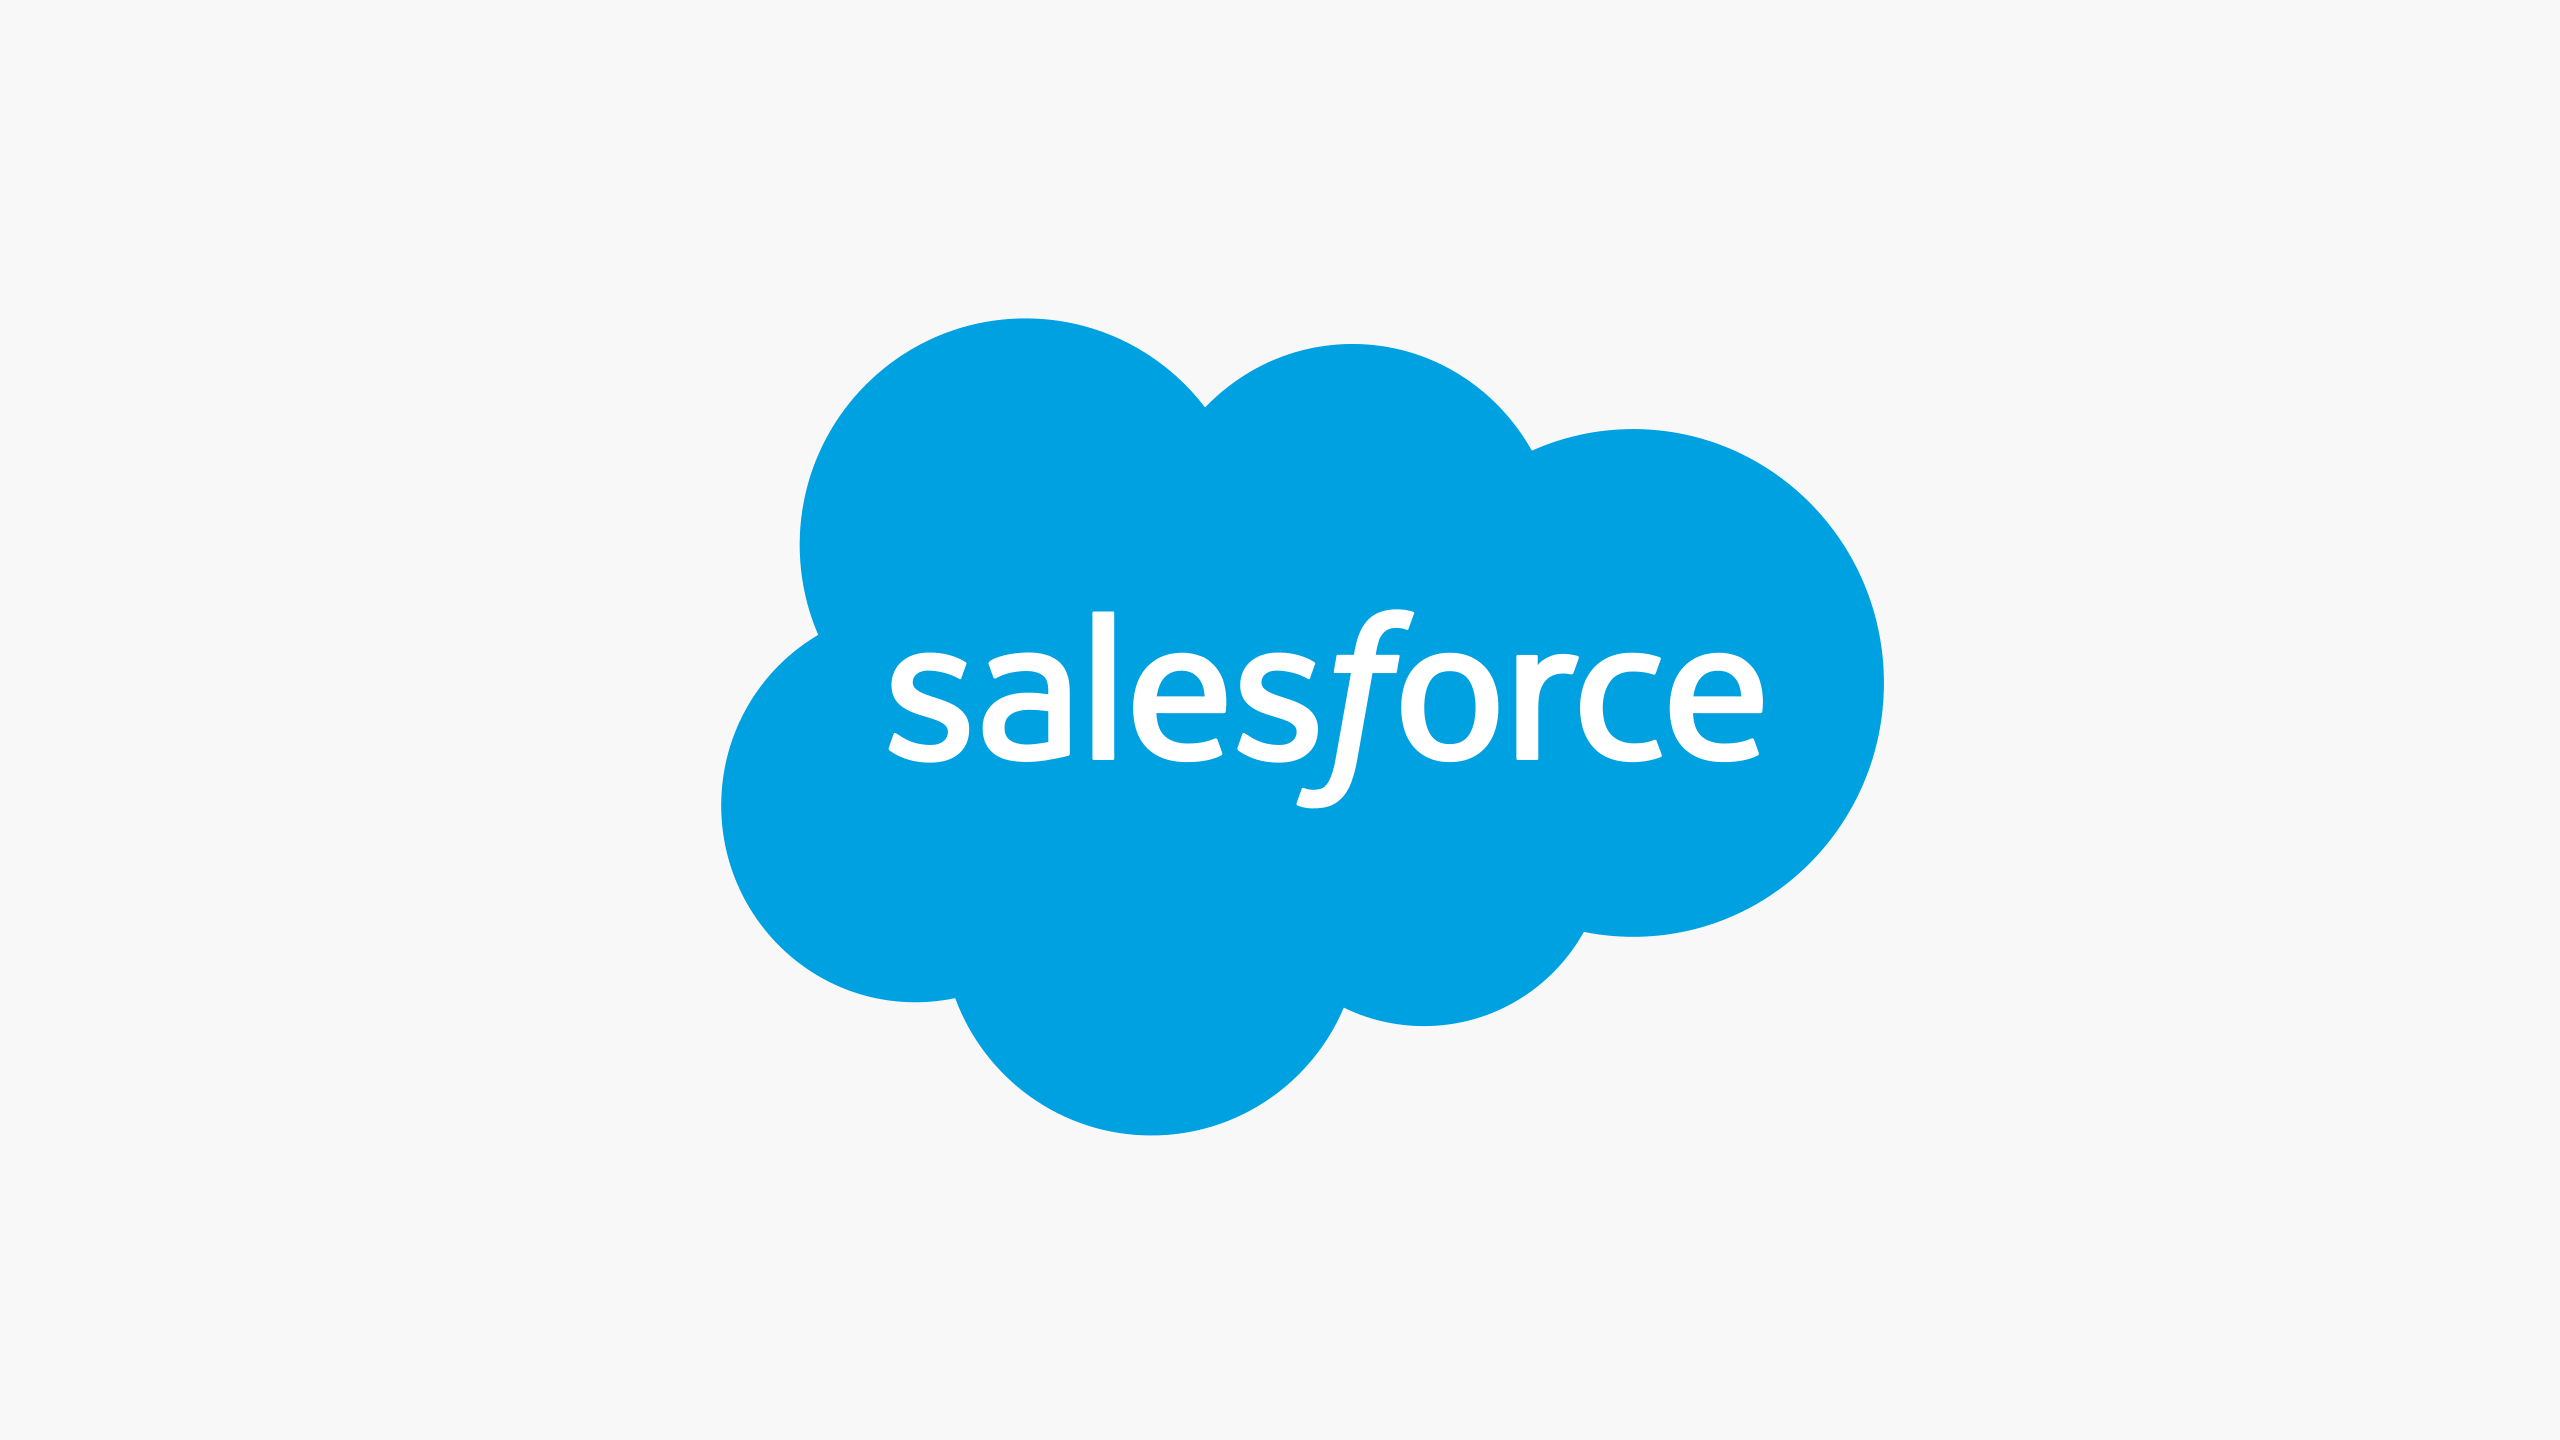 salesforce-brand-logo-blue-on-gray